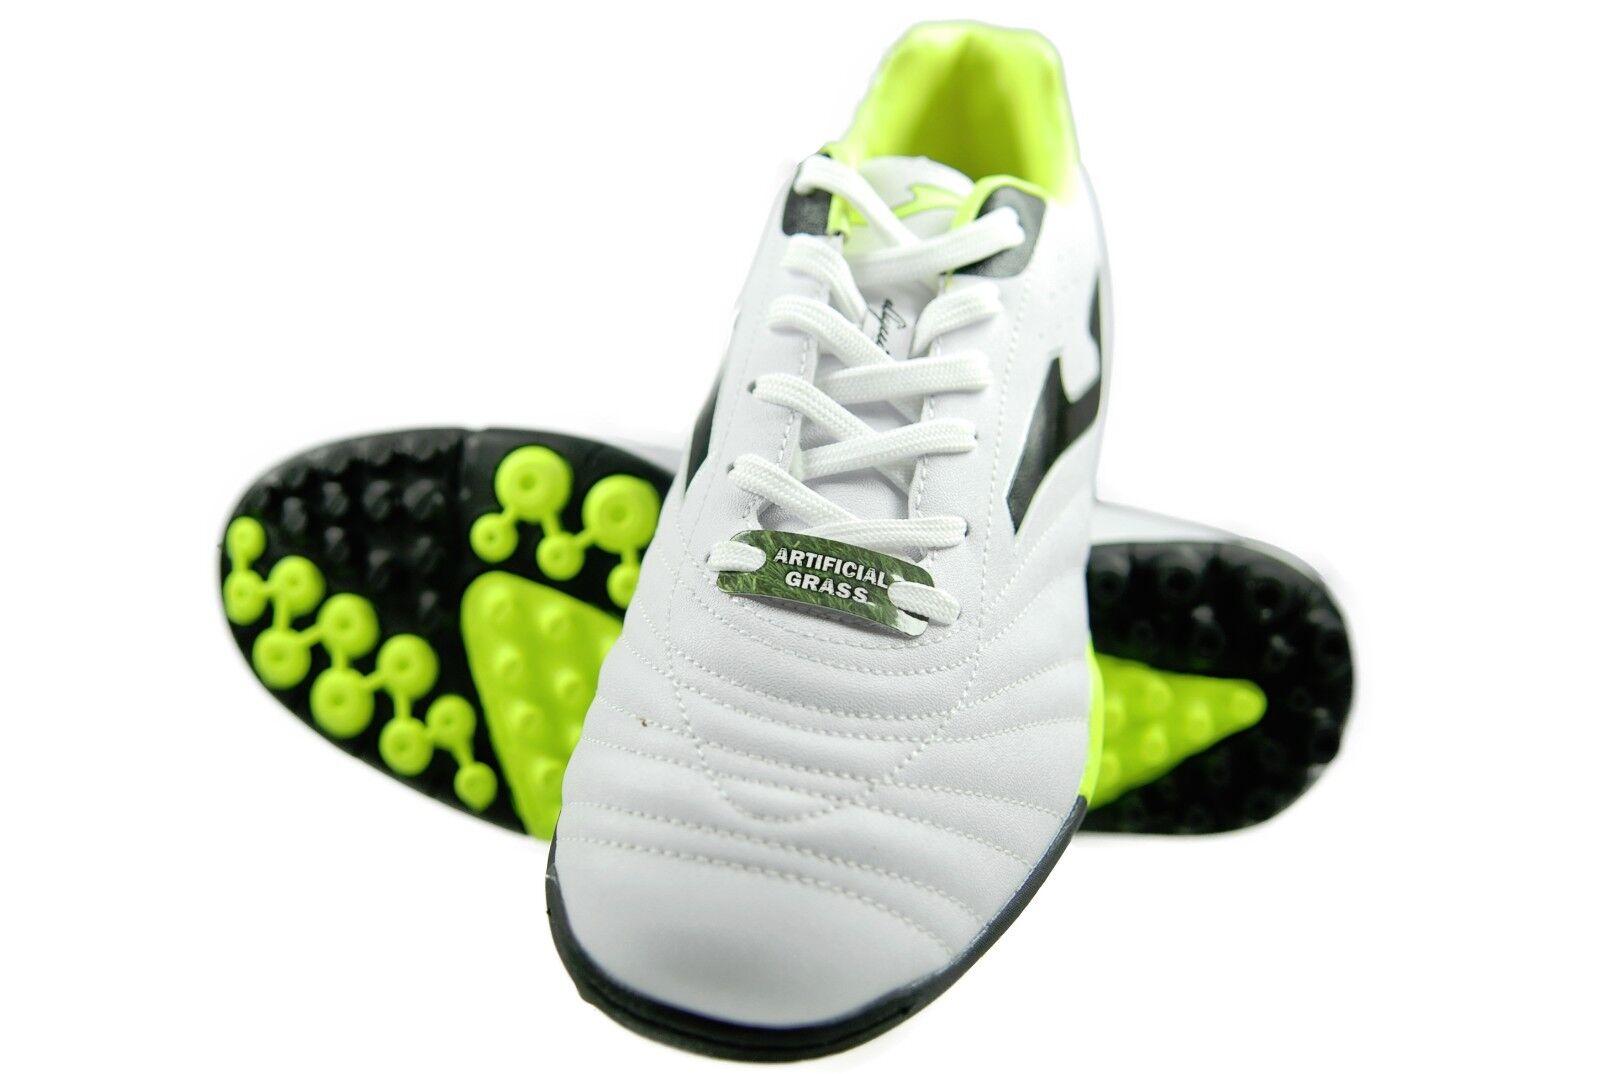 Authentic Joma Turf scarpe Style Aguila 602 Soccer scarpe